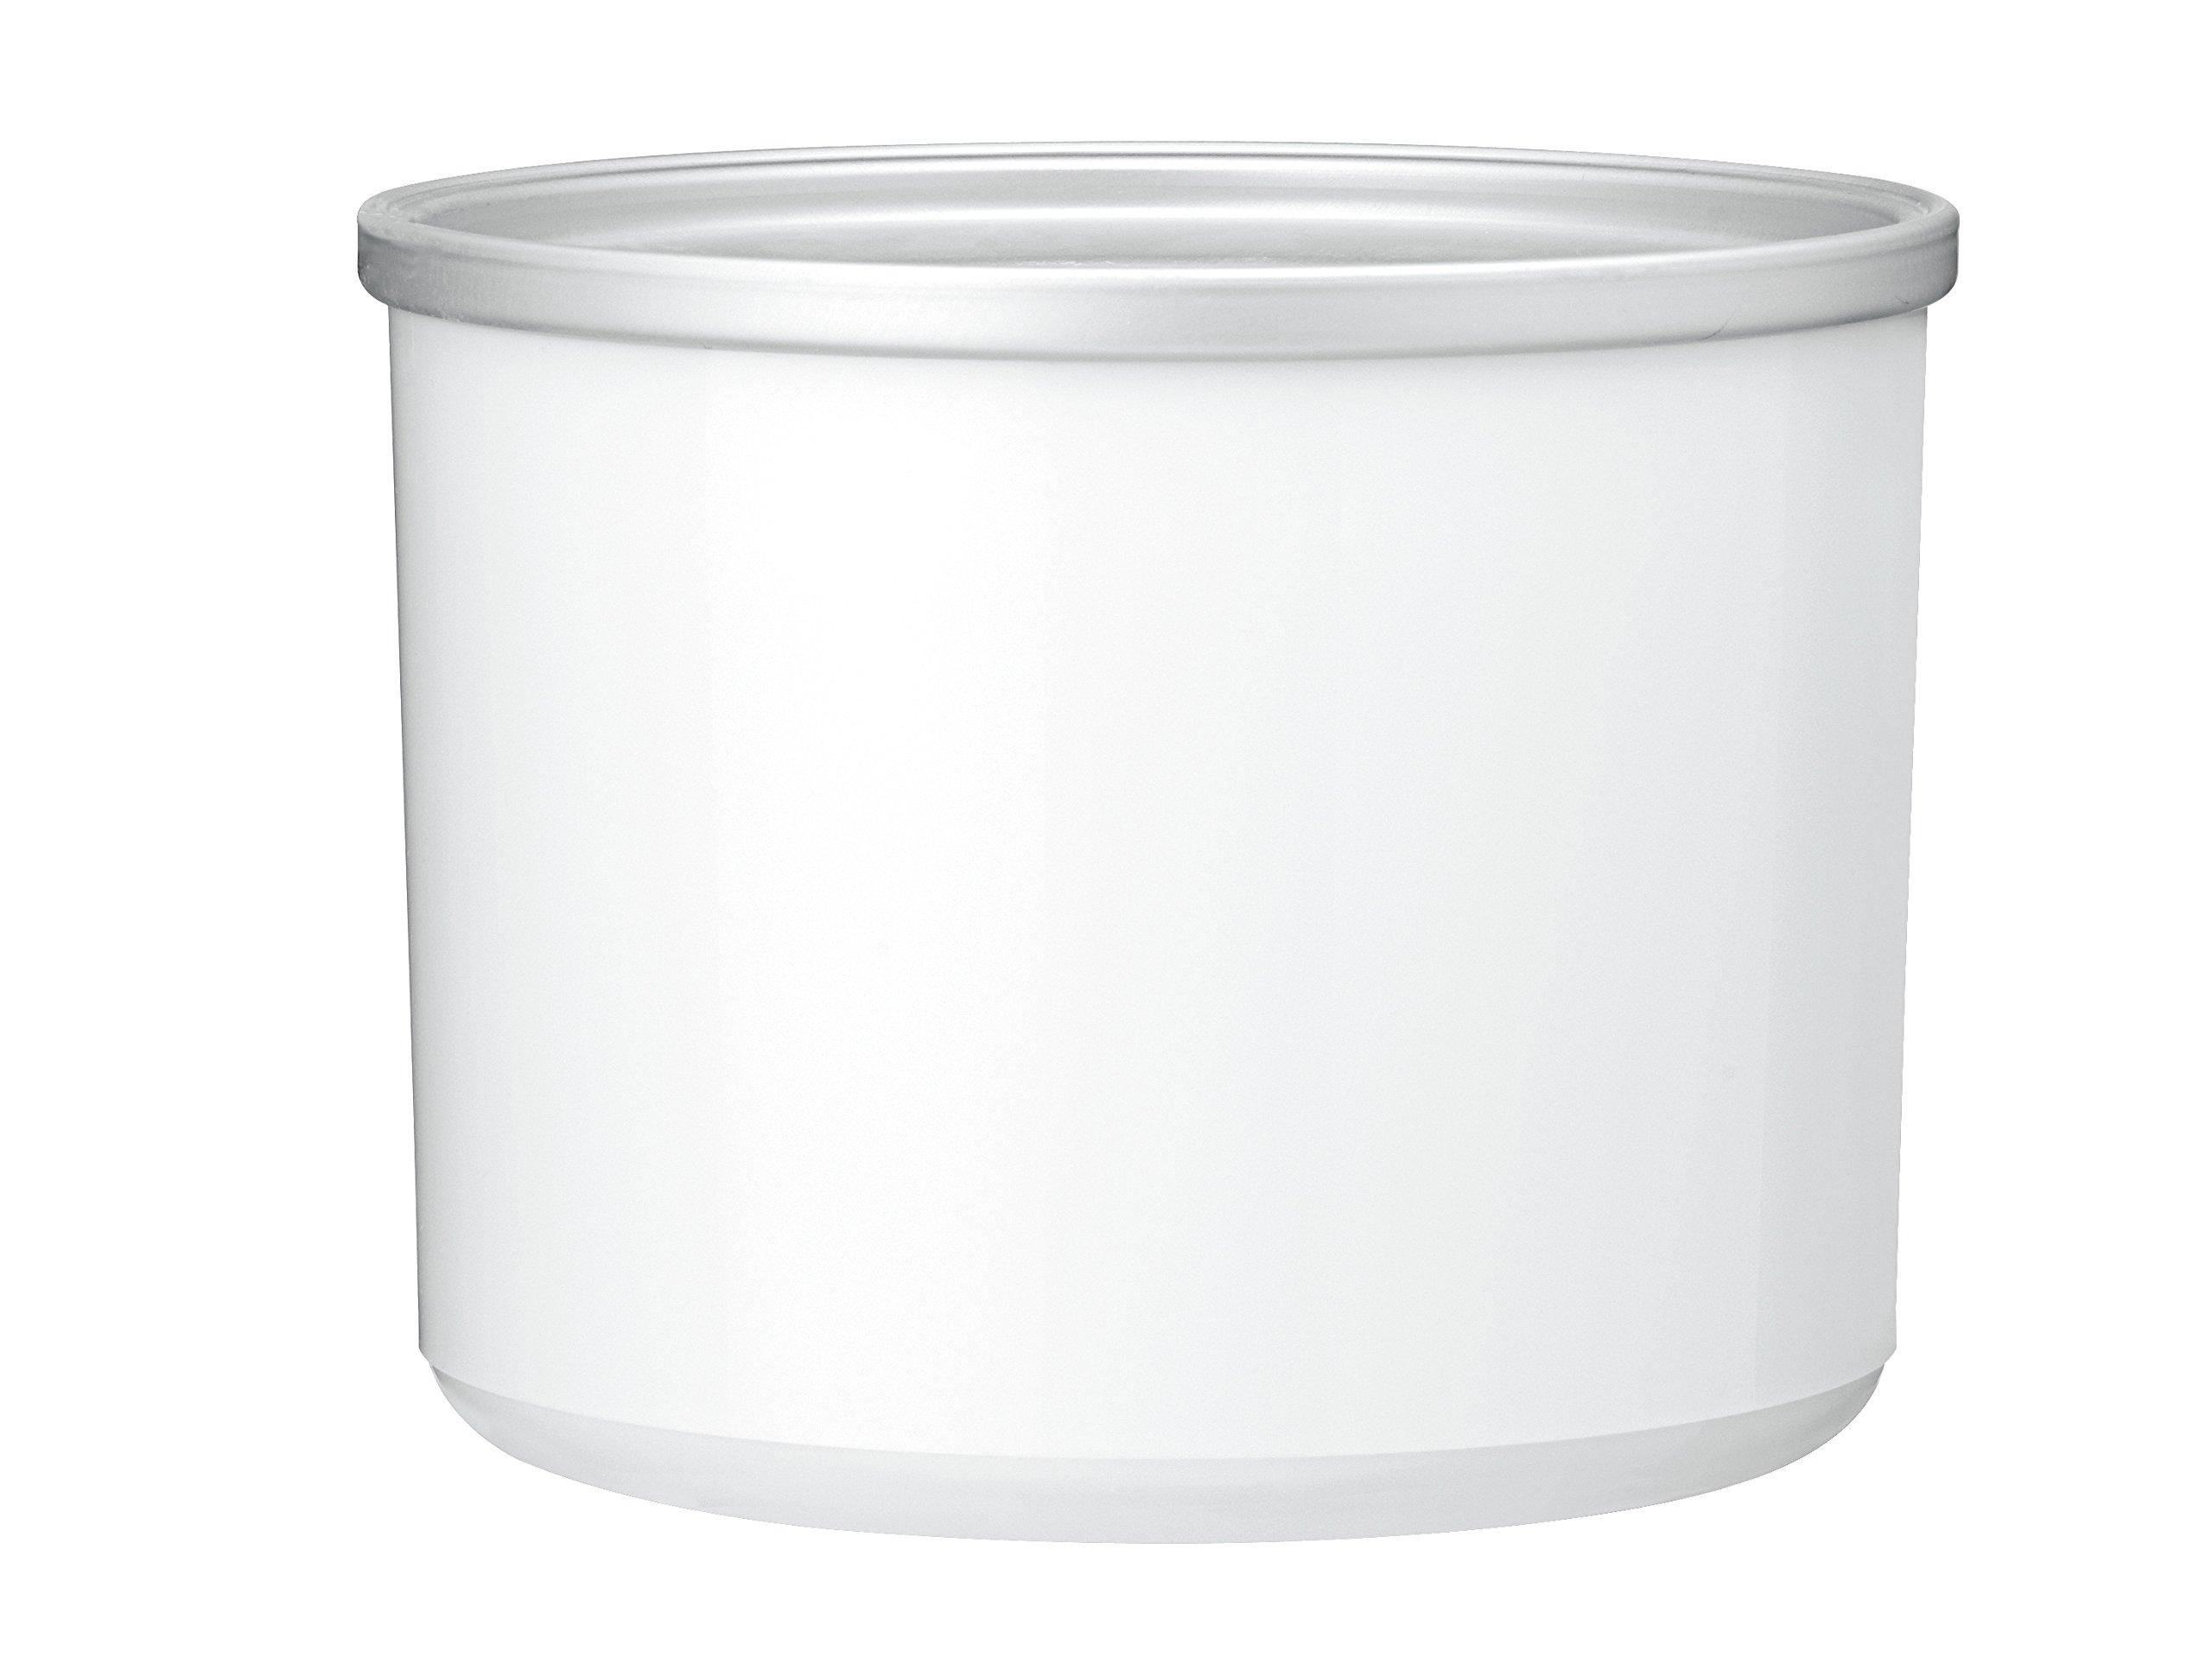 Cuisinart ICE-70RFB Replacement Freezer Bowl, 2 quart, Gray